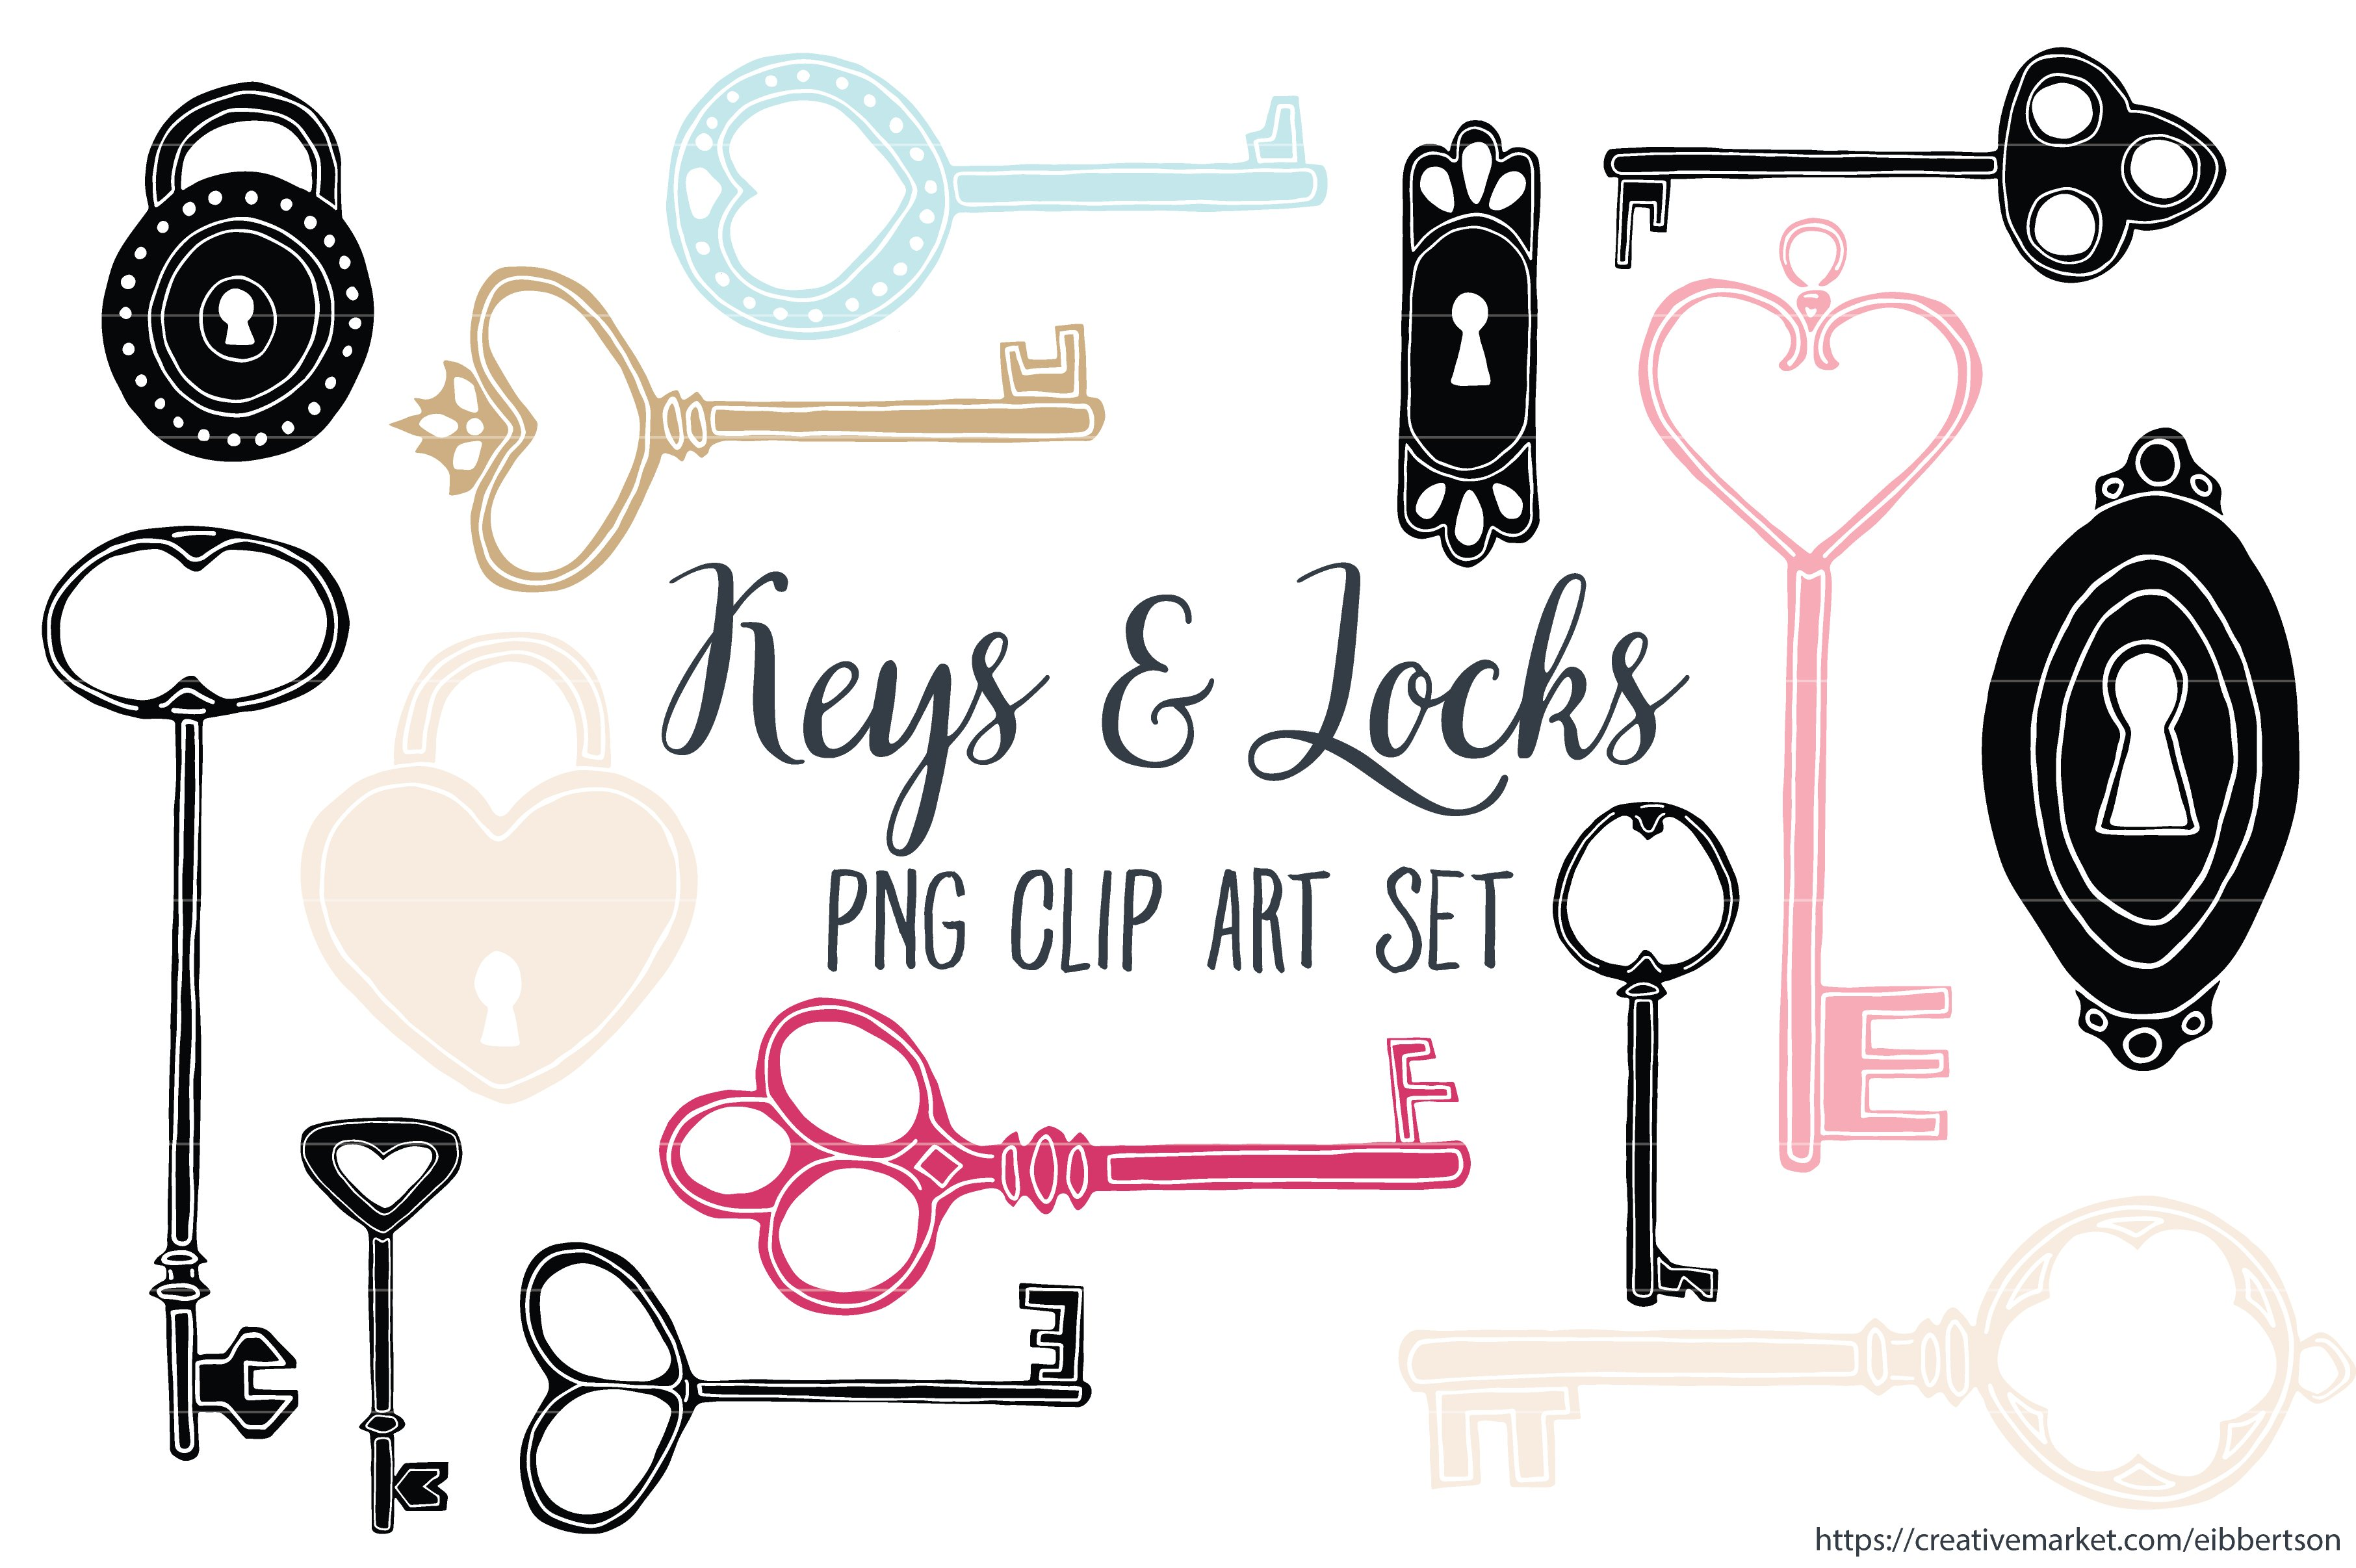 Skeleton key clip art Photos, Graphics, Fonts, Themes, Templates ...